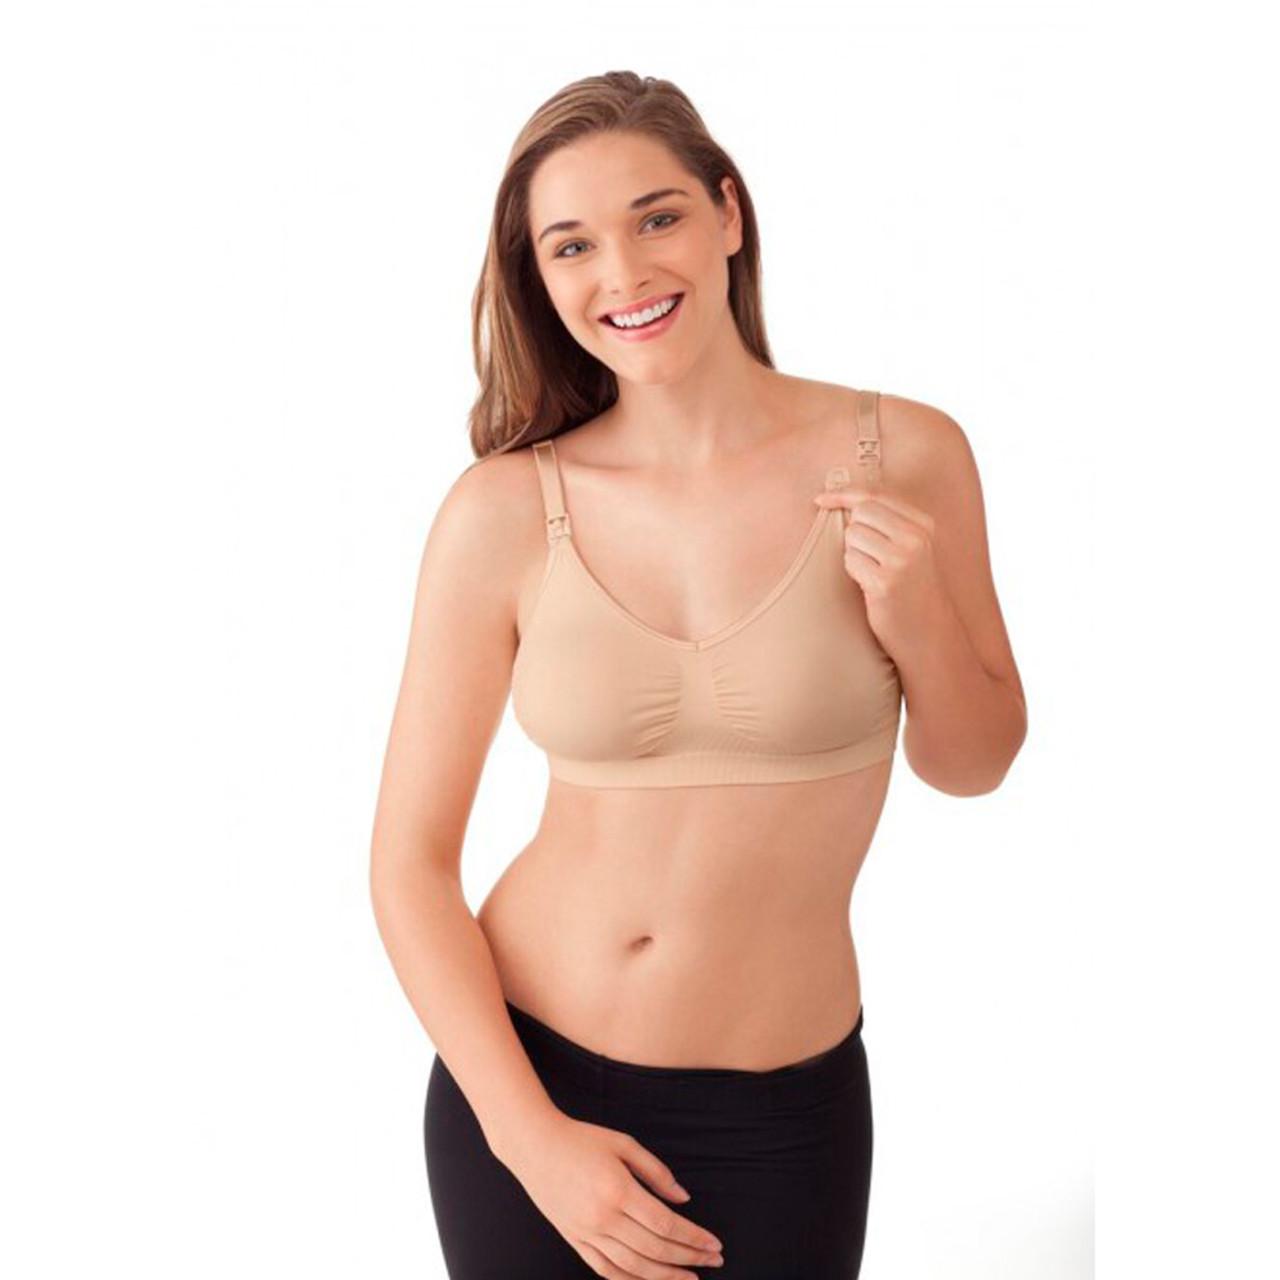 f8364b99c4 Medela Comfort Nursing Bra - Nude (XL) - Dear-Born Baby